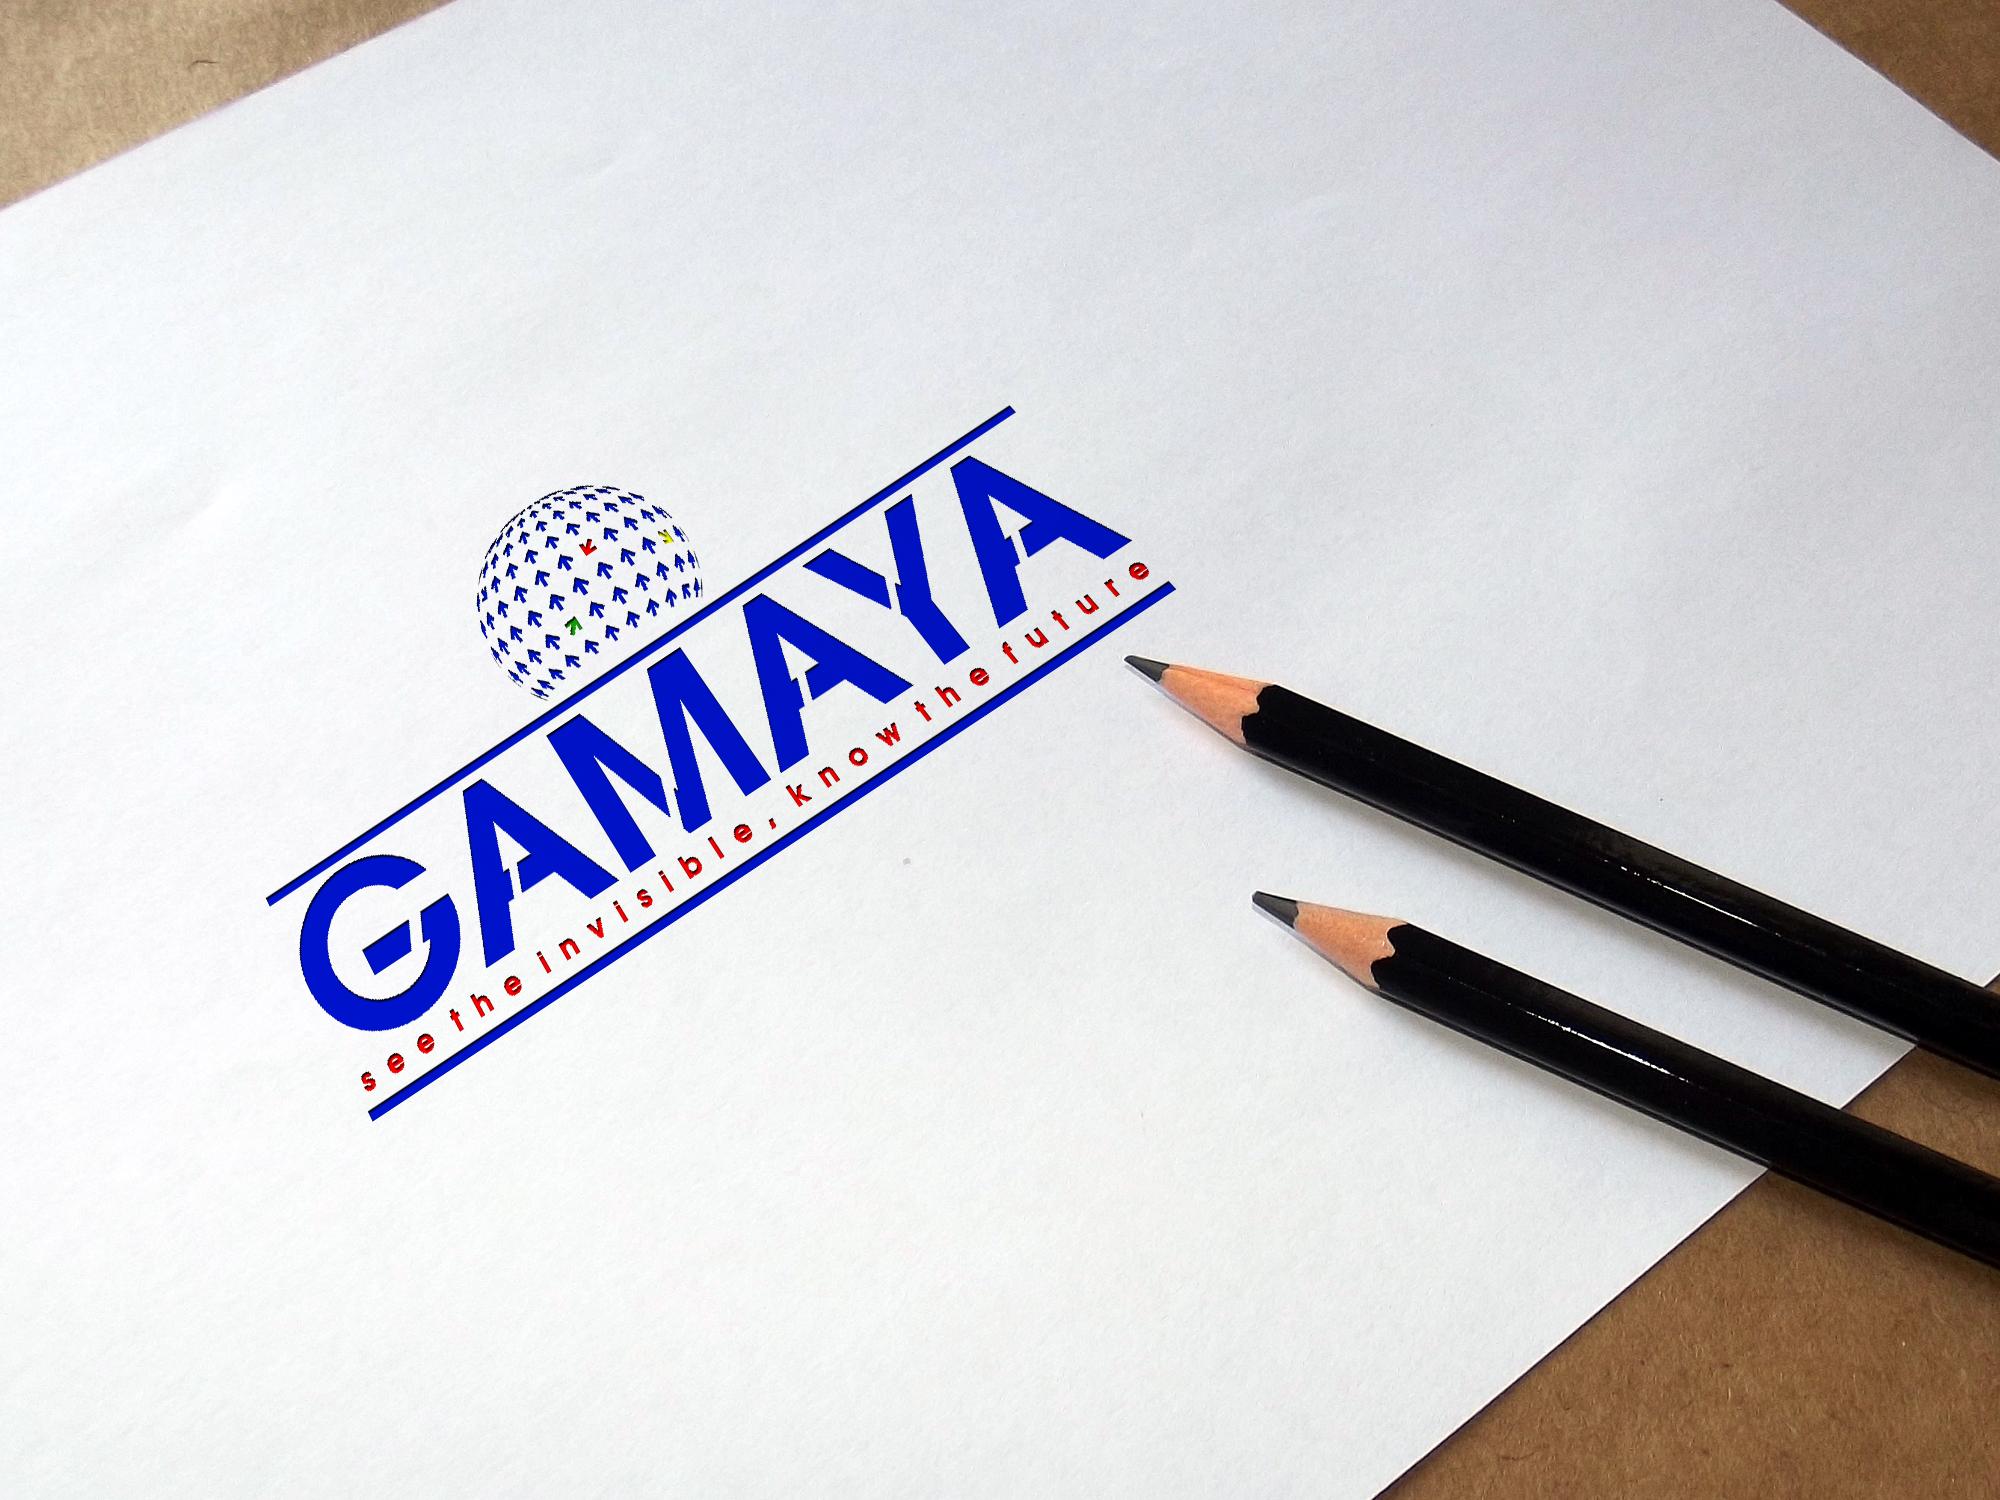 Разработка логотипа для компании Gamaya фото f_8575486b44796c54.jpg